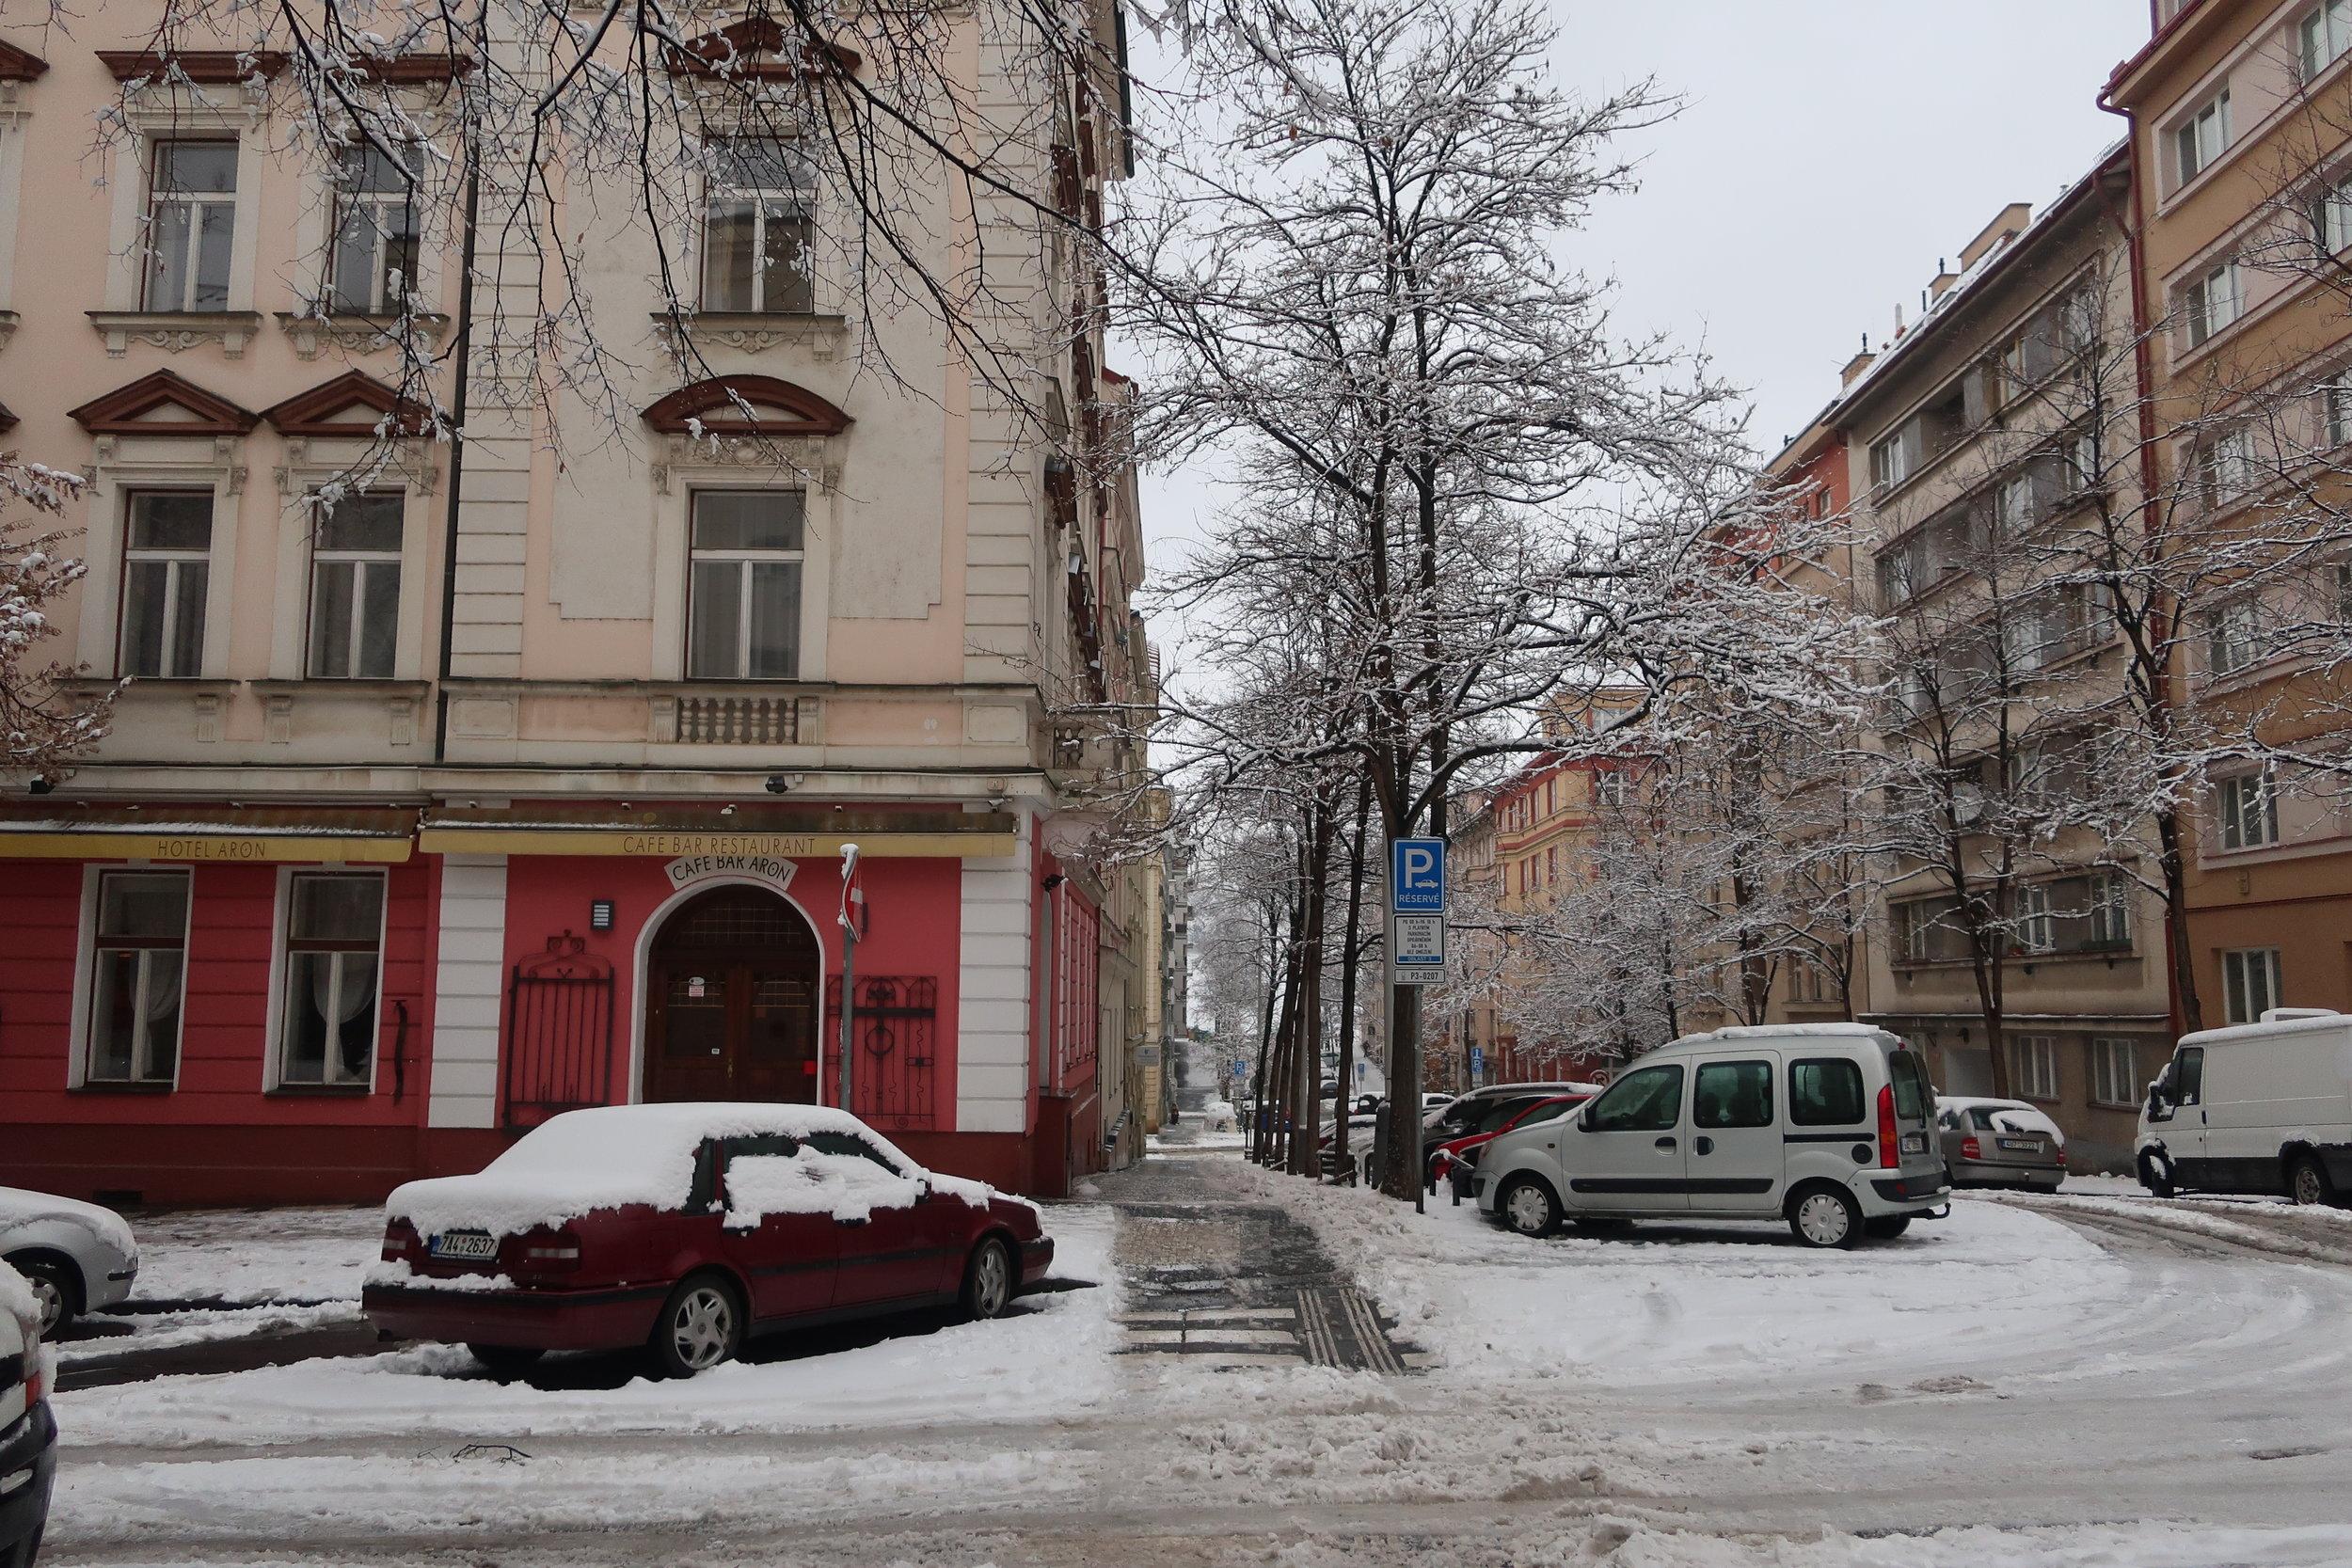 Snowy scene outside of CARP main headquarters